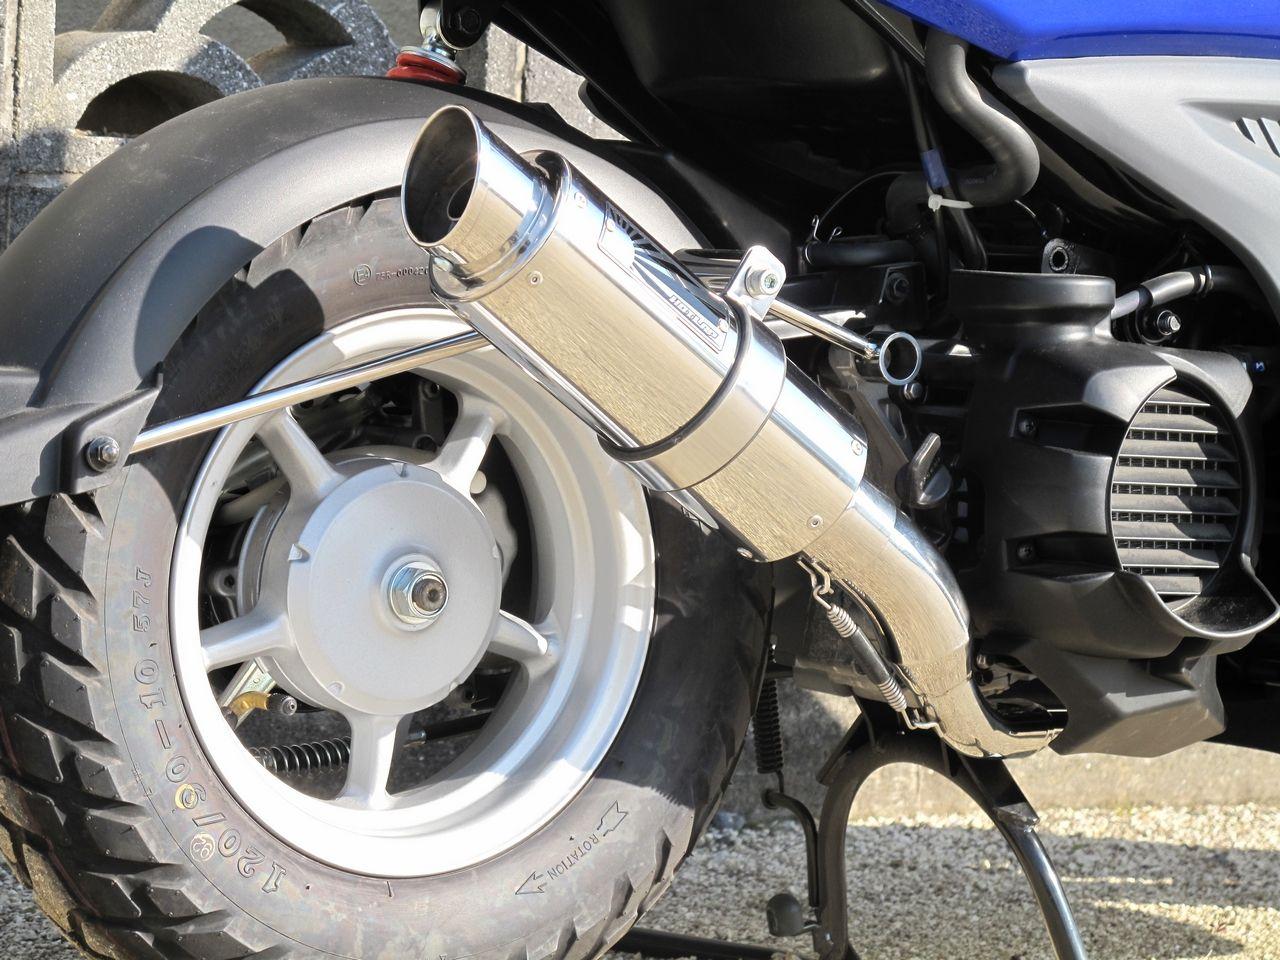 【HOT LAP】Sport 全段排氣管 不銹鋼 - 「Webike-摩托百貨」